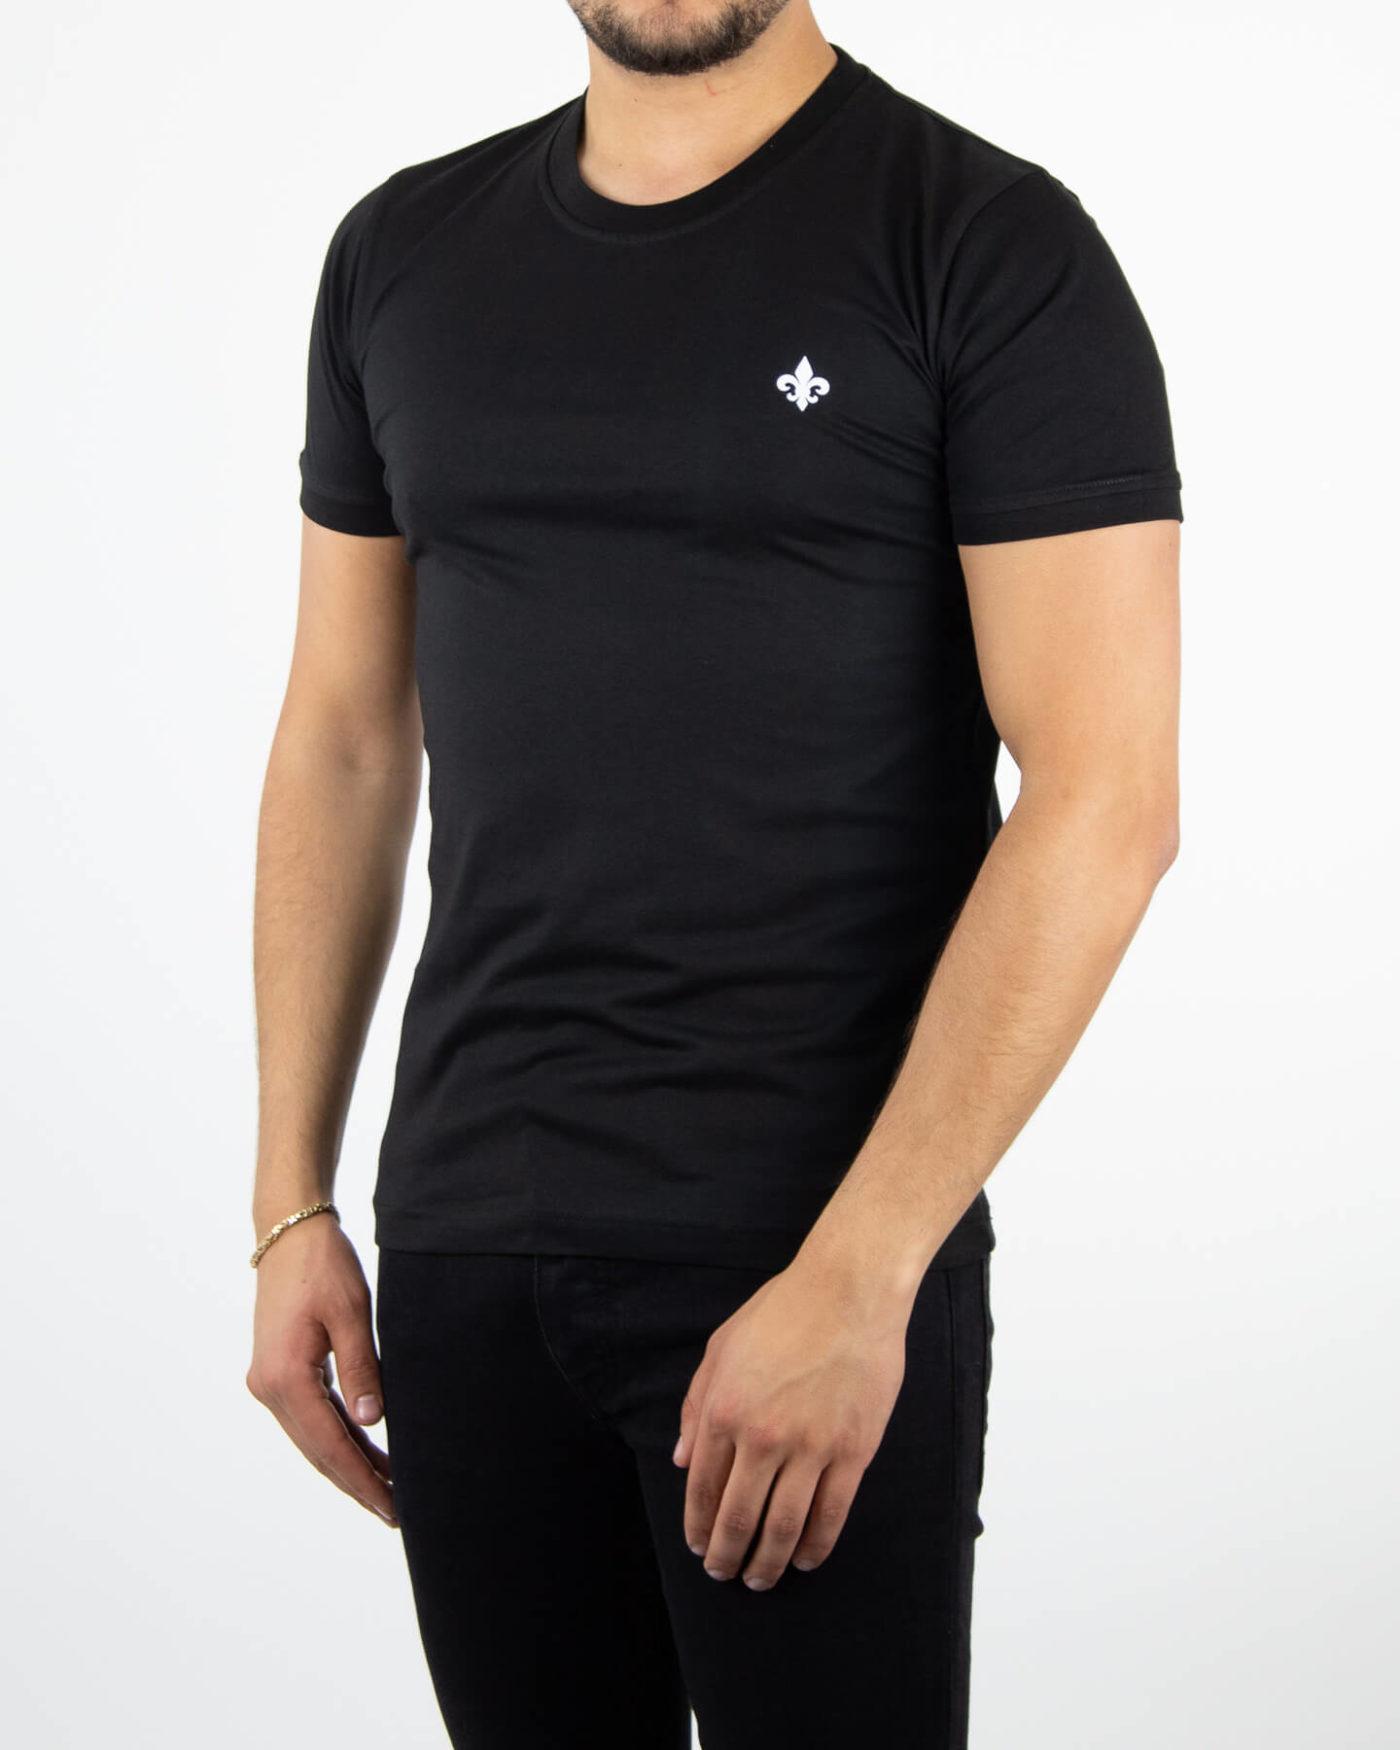 Mayor Black Shirt-1